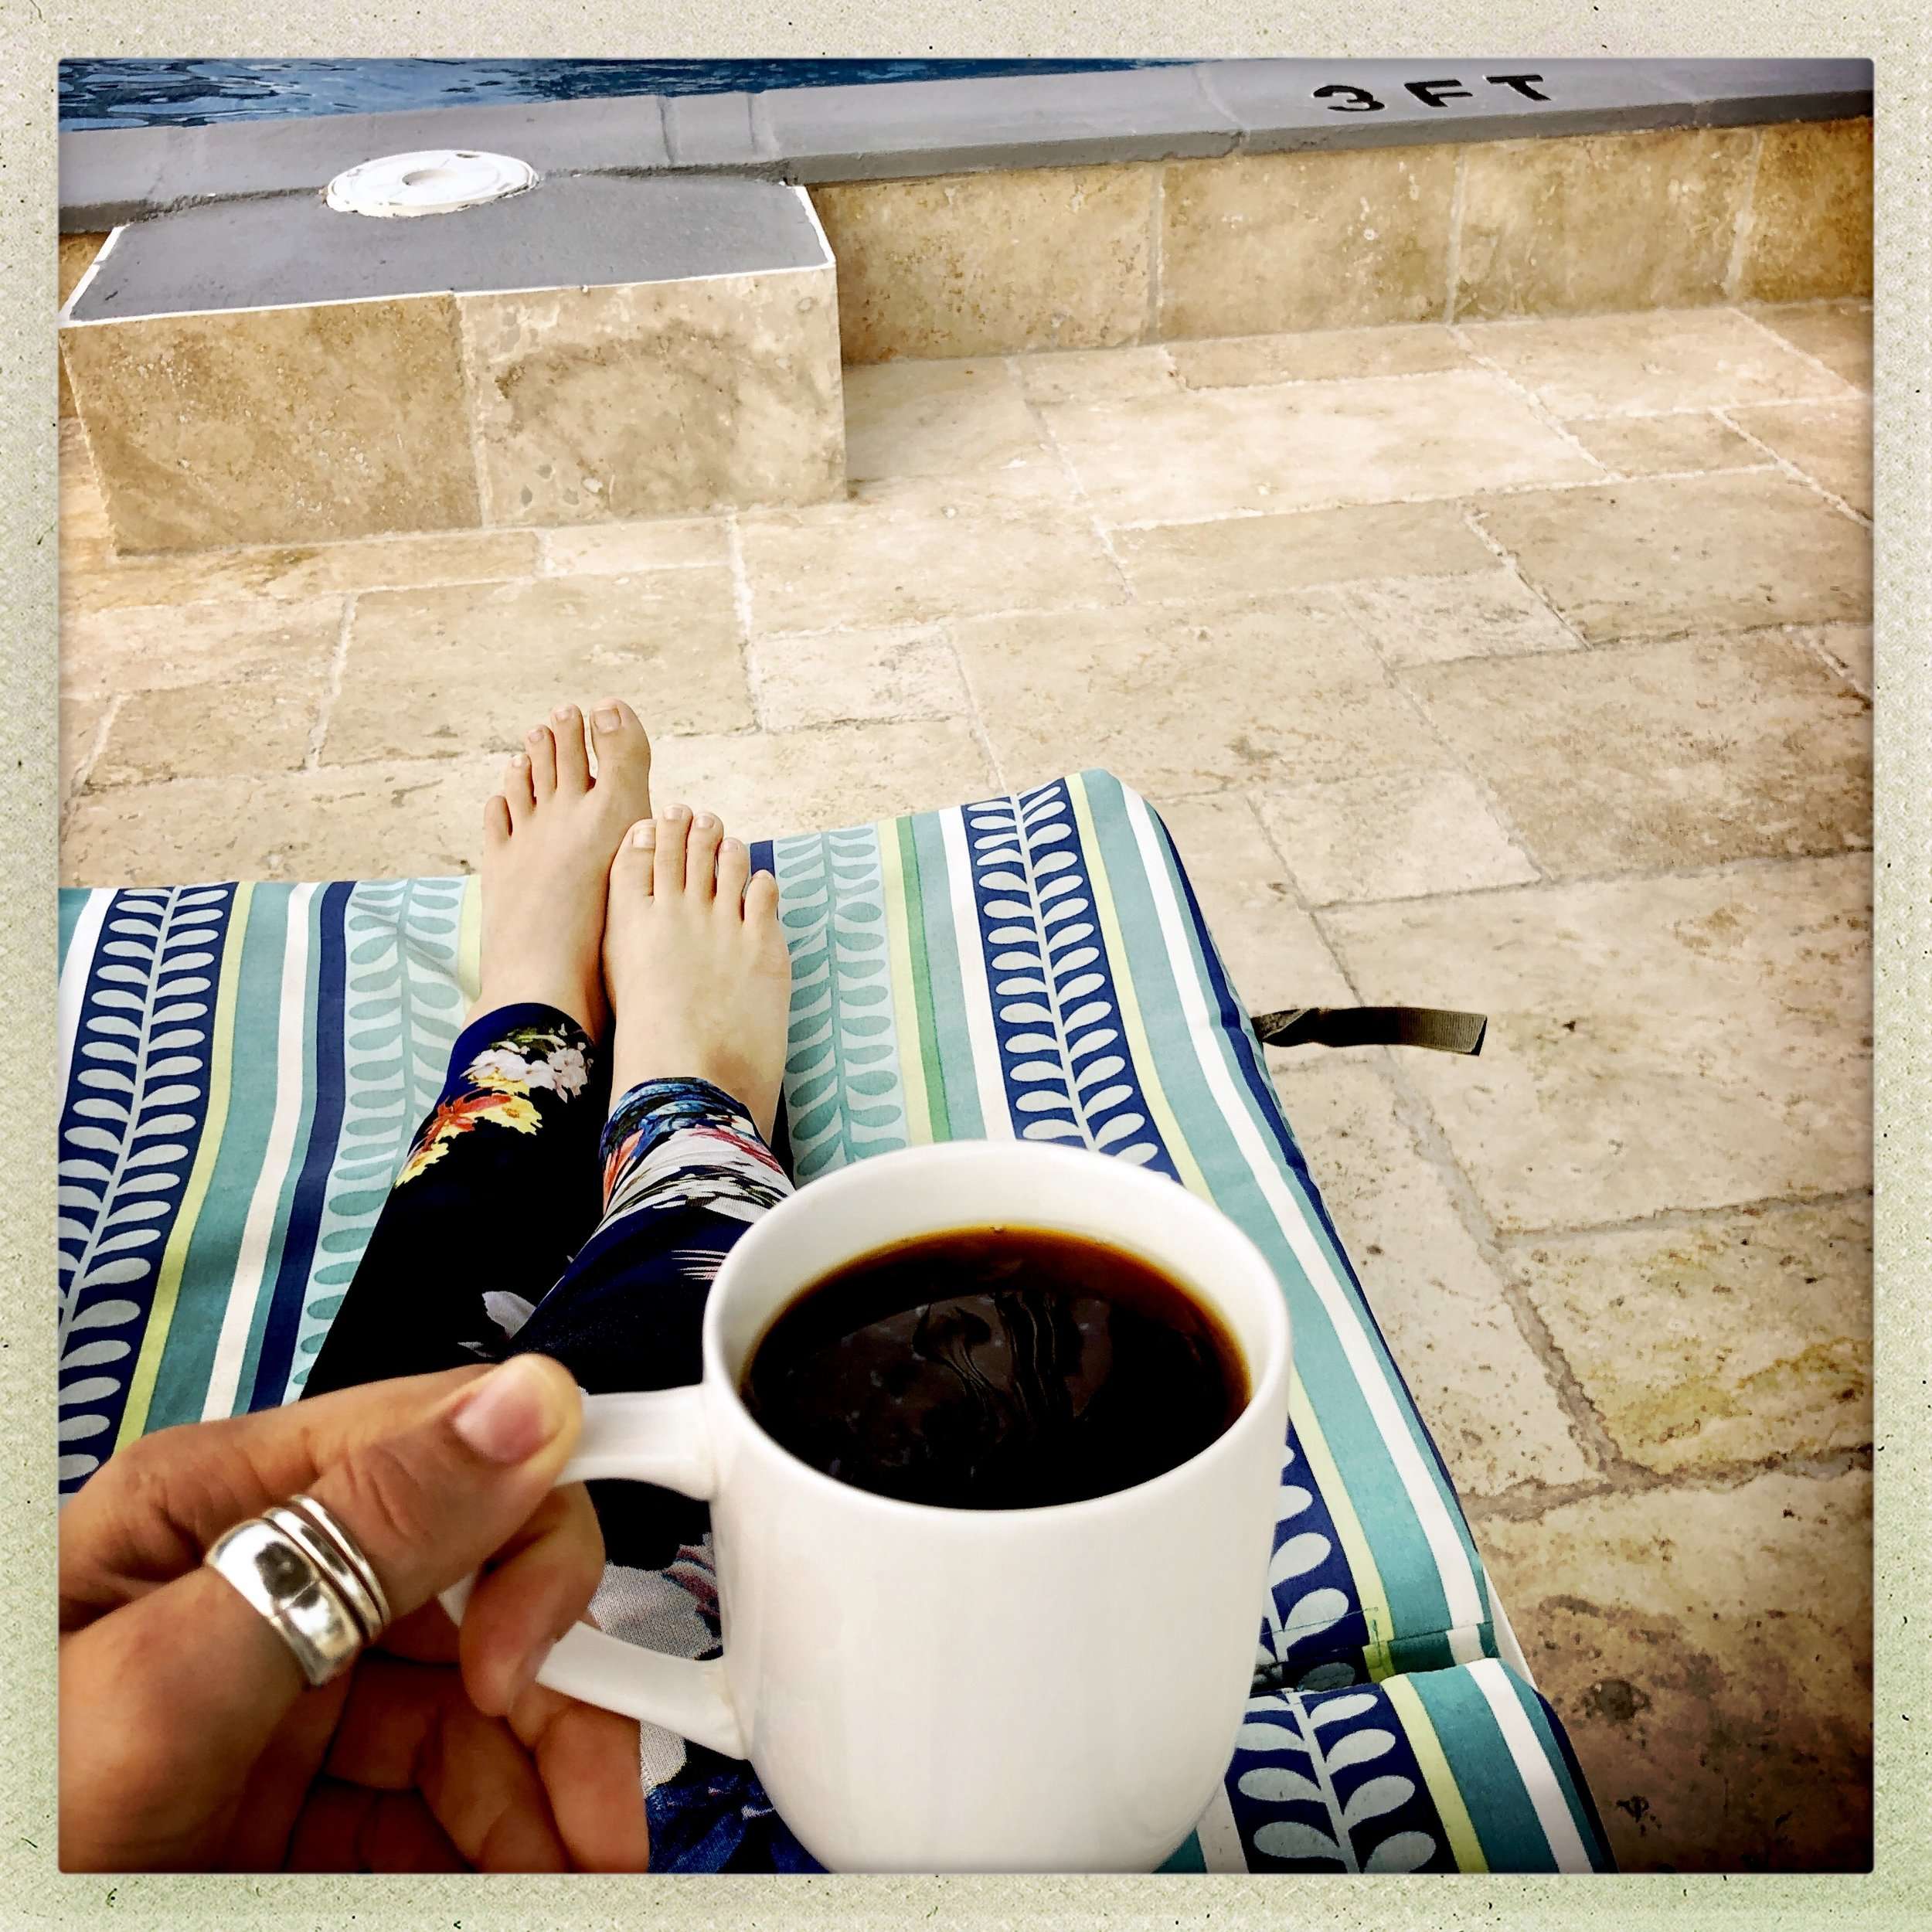 Morning coffee poolside at Ocean Reef Yacht Club & Resort on Grand Bahama Island